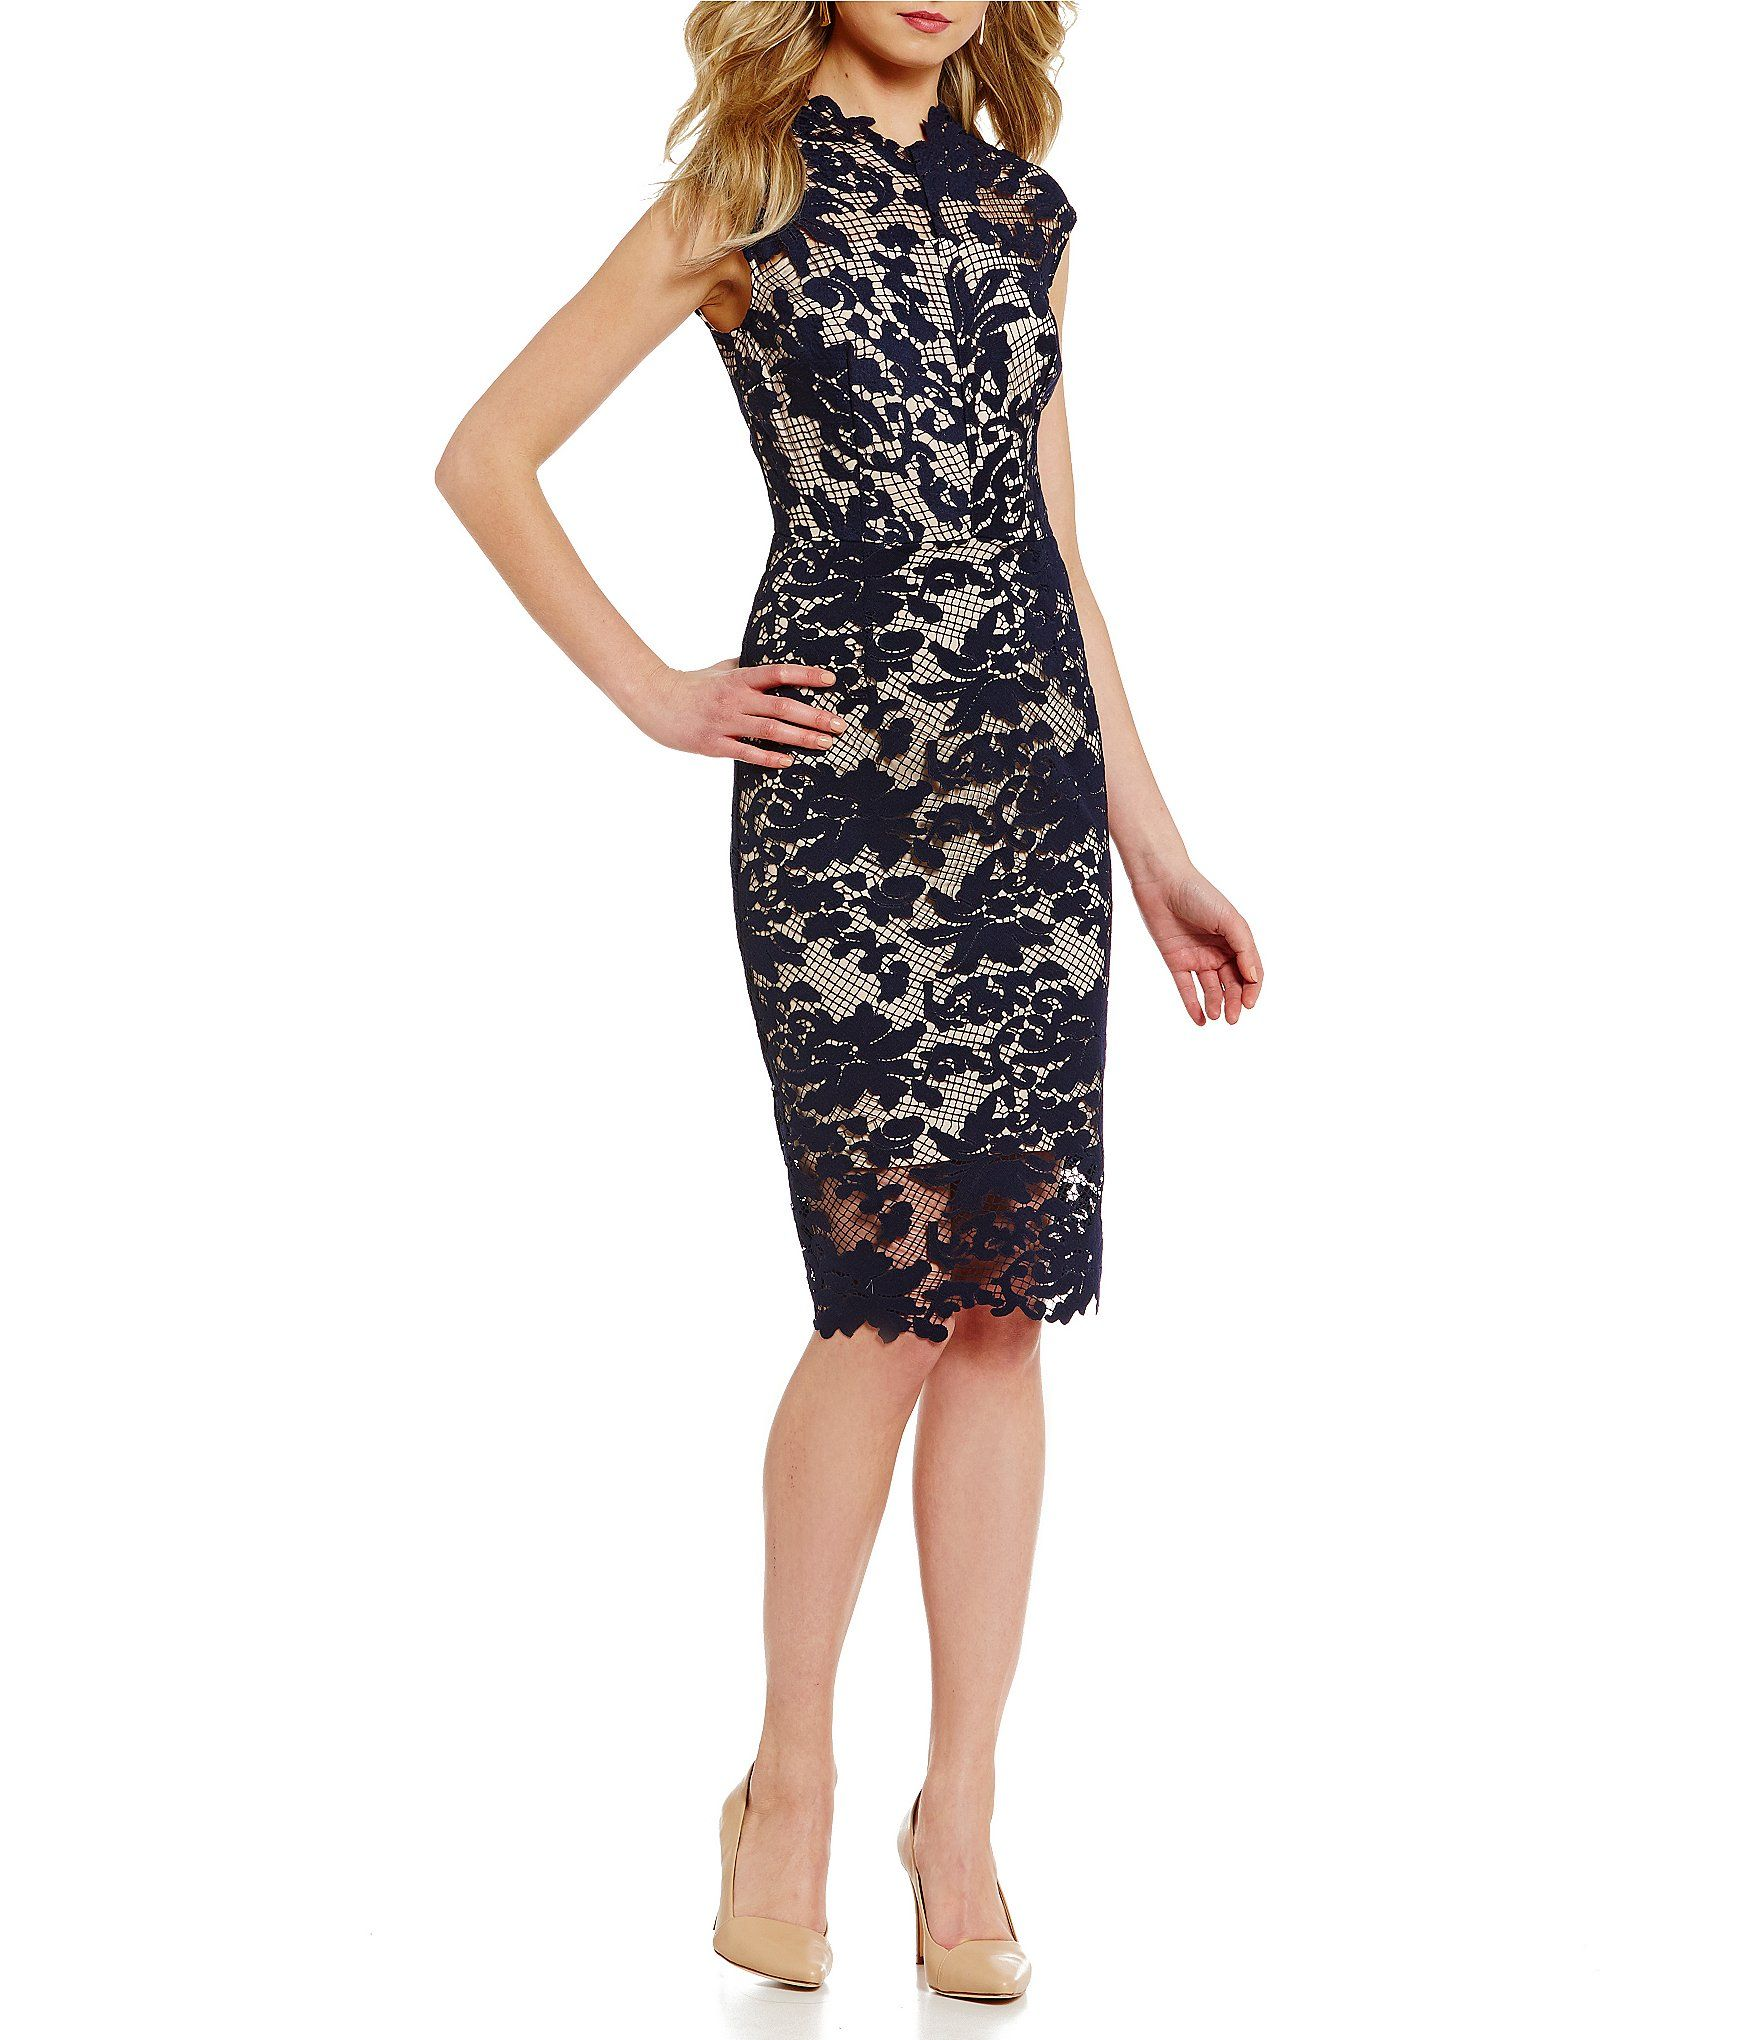 7fa1e449f5c Shop for Antonio Melani Madeleine Mock Neck Sleeveless Lace Sheath Dress at  Dillards.com. Visit Dillards.com to find clothing